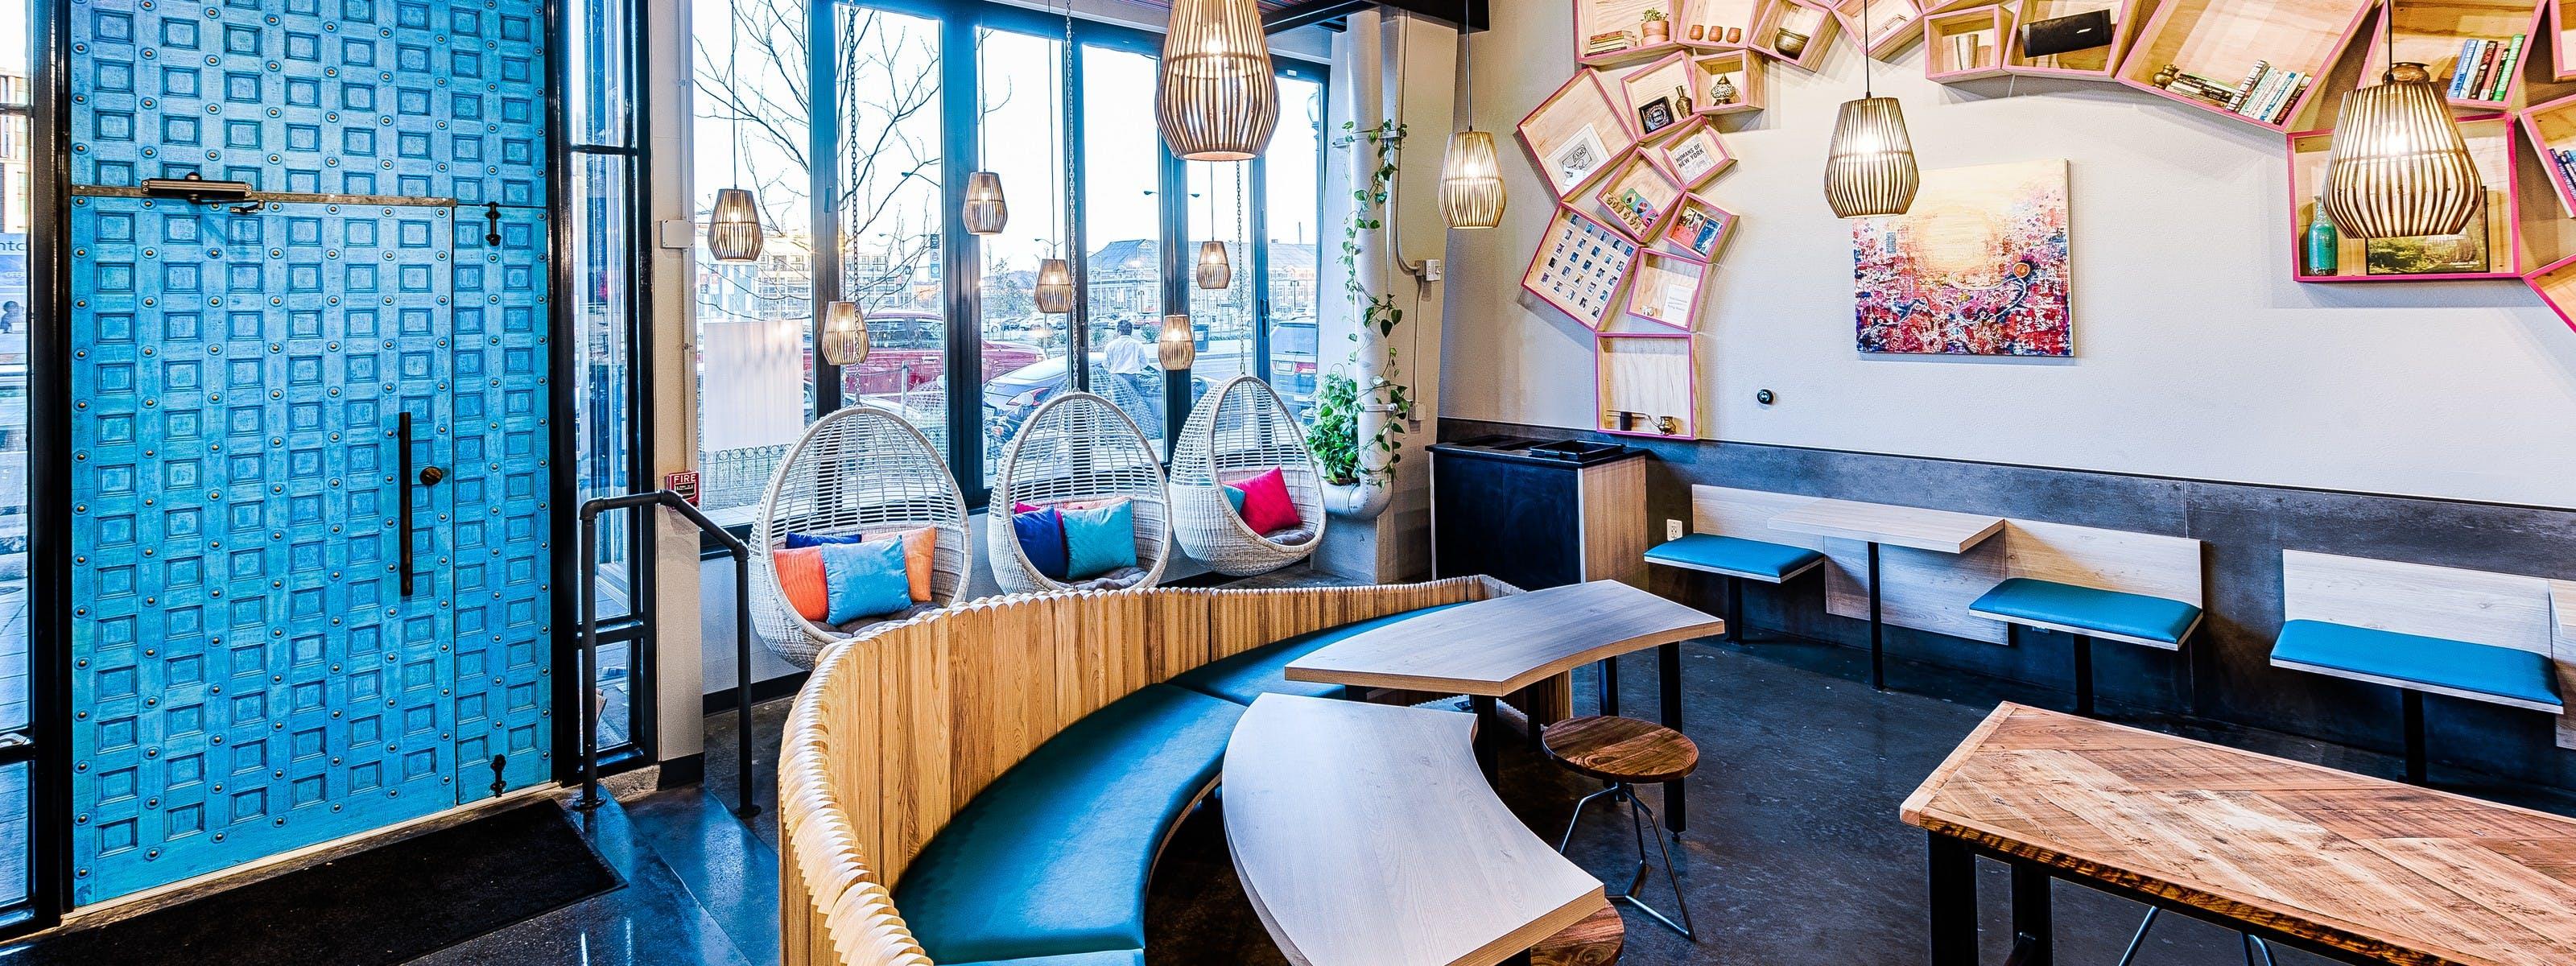 The DC Hit List: The Best New Restaurants In Washington DC - Washington DC - The Infatuation